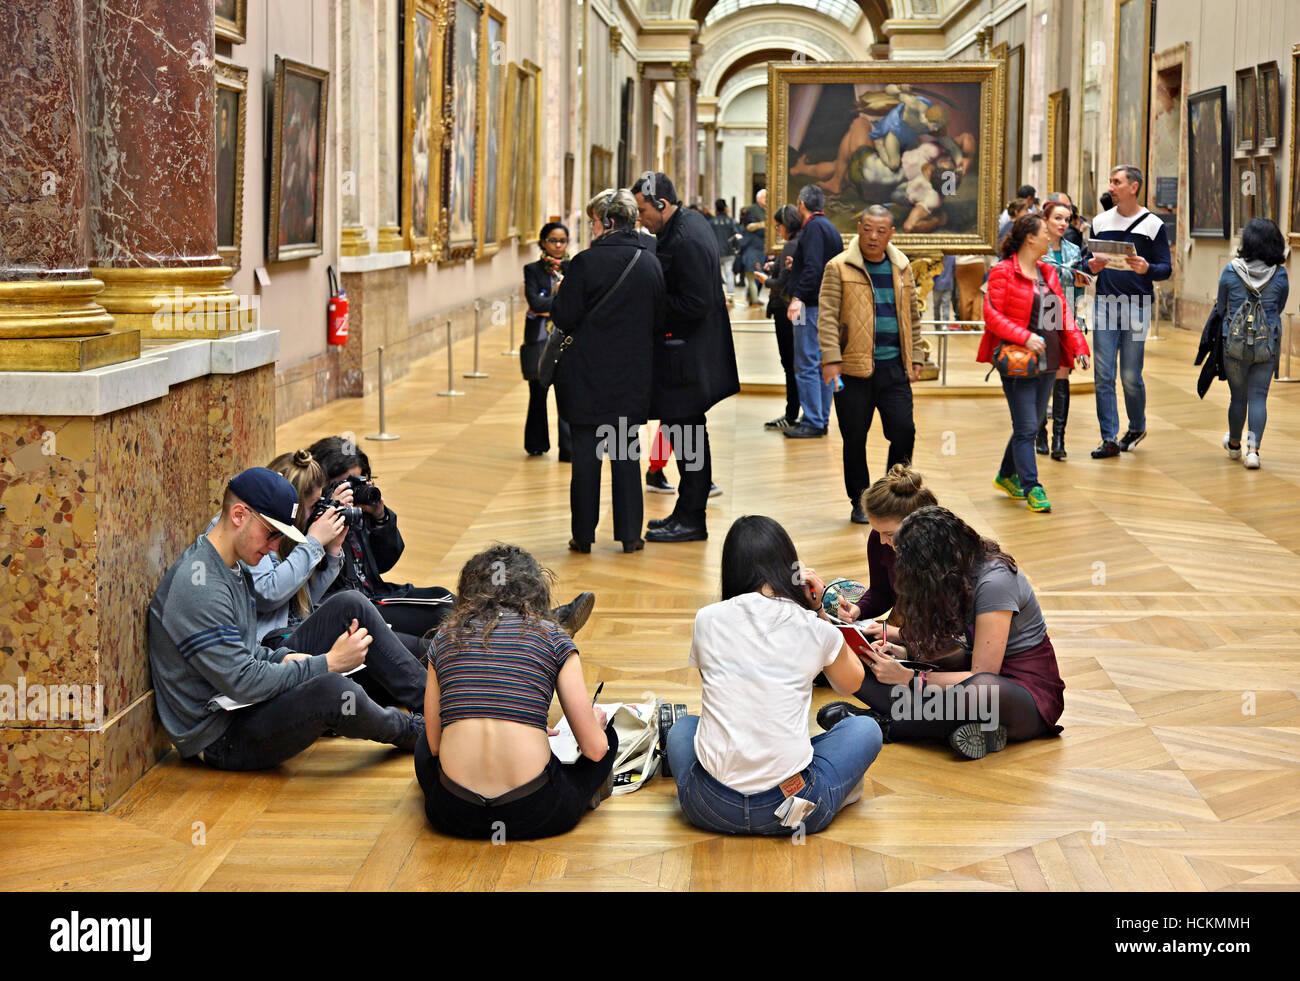 The Grande Galerie, Louvre museum, Paris, France. Stock Photo